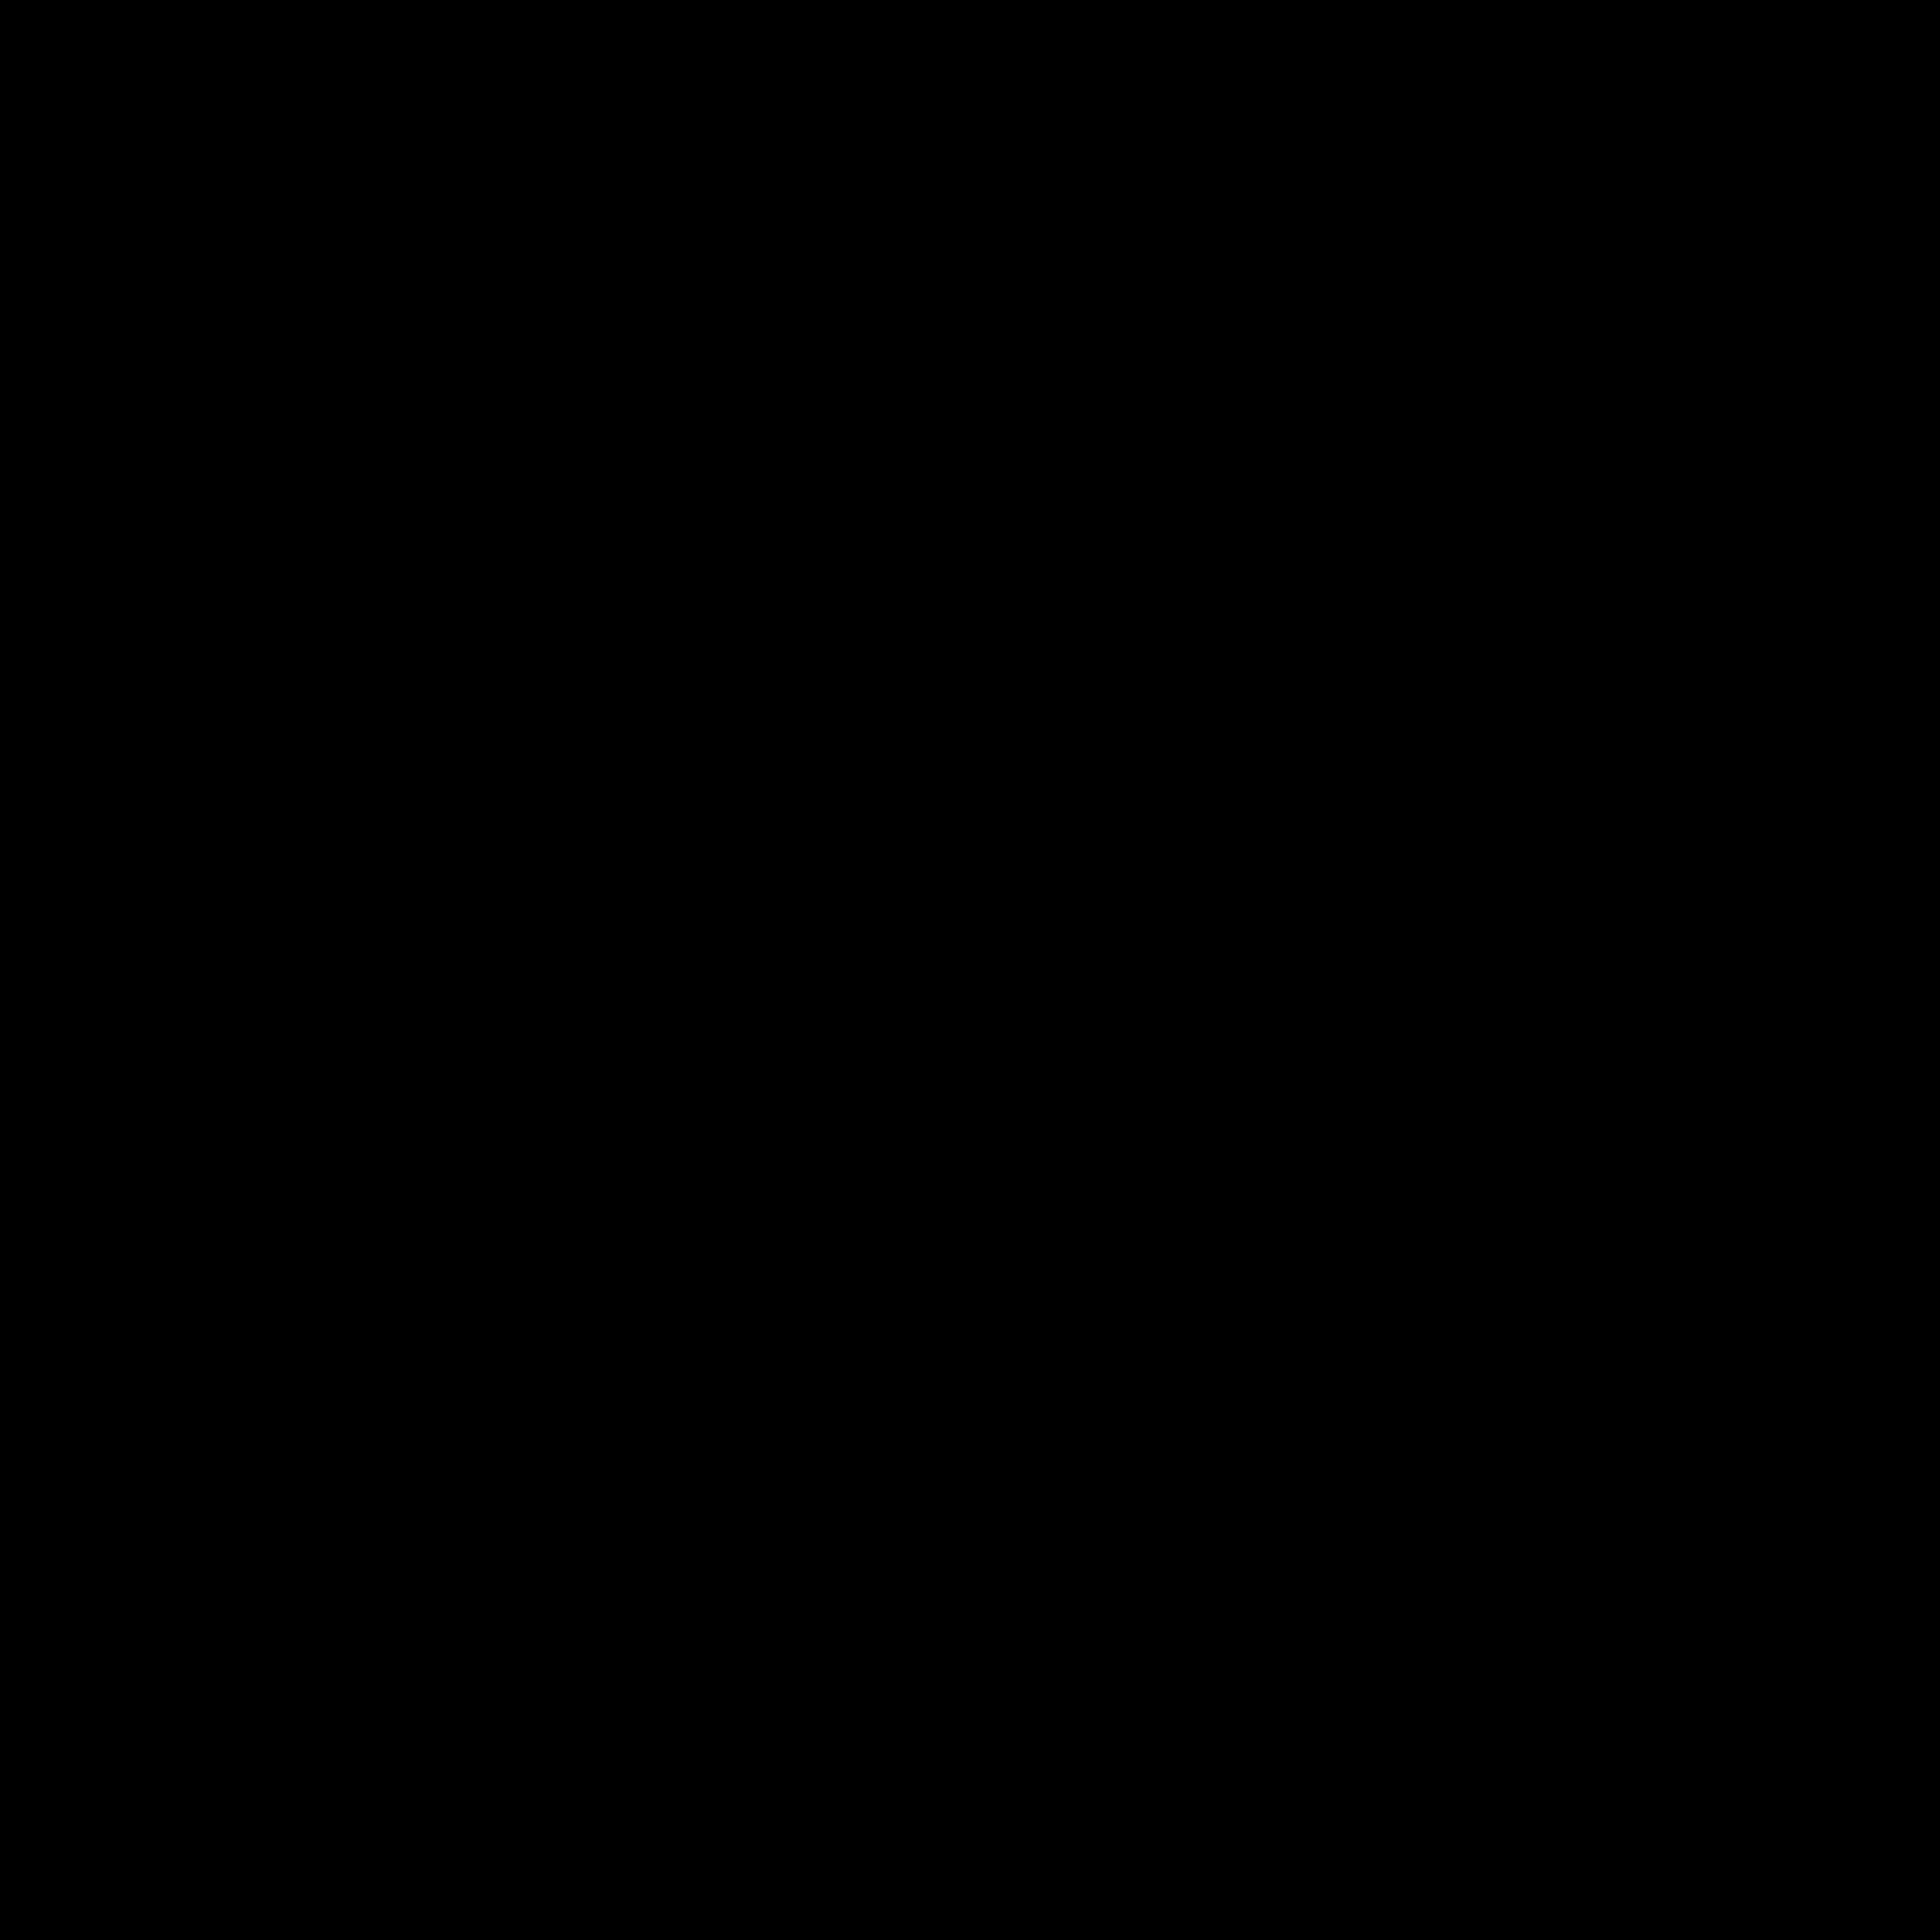 File svg wikimedia commons. Instruments clipart mridangam